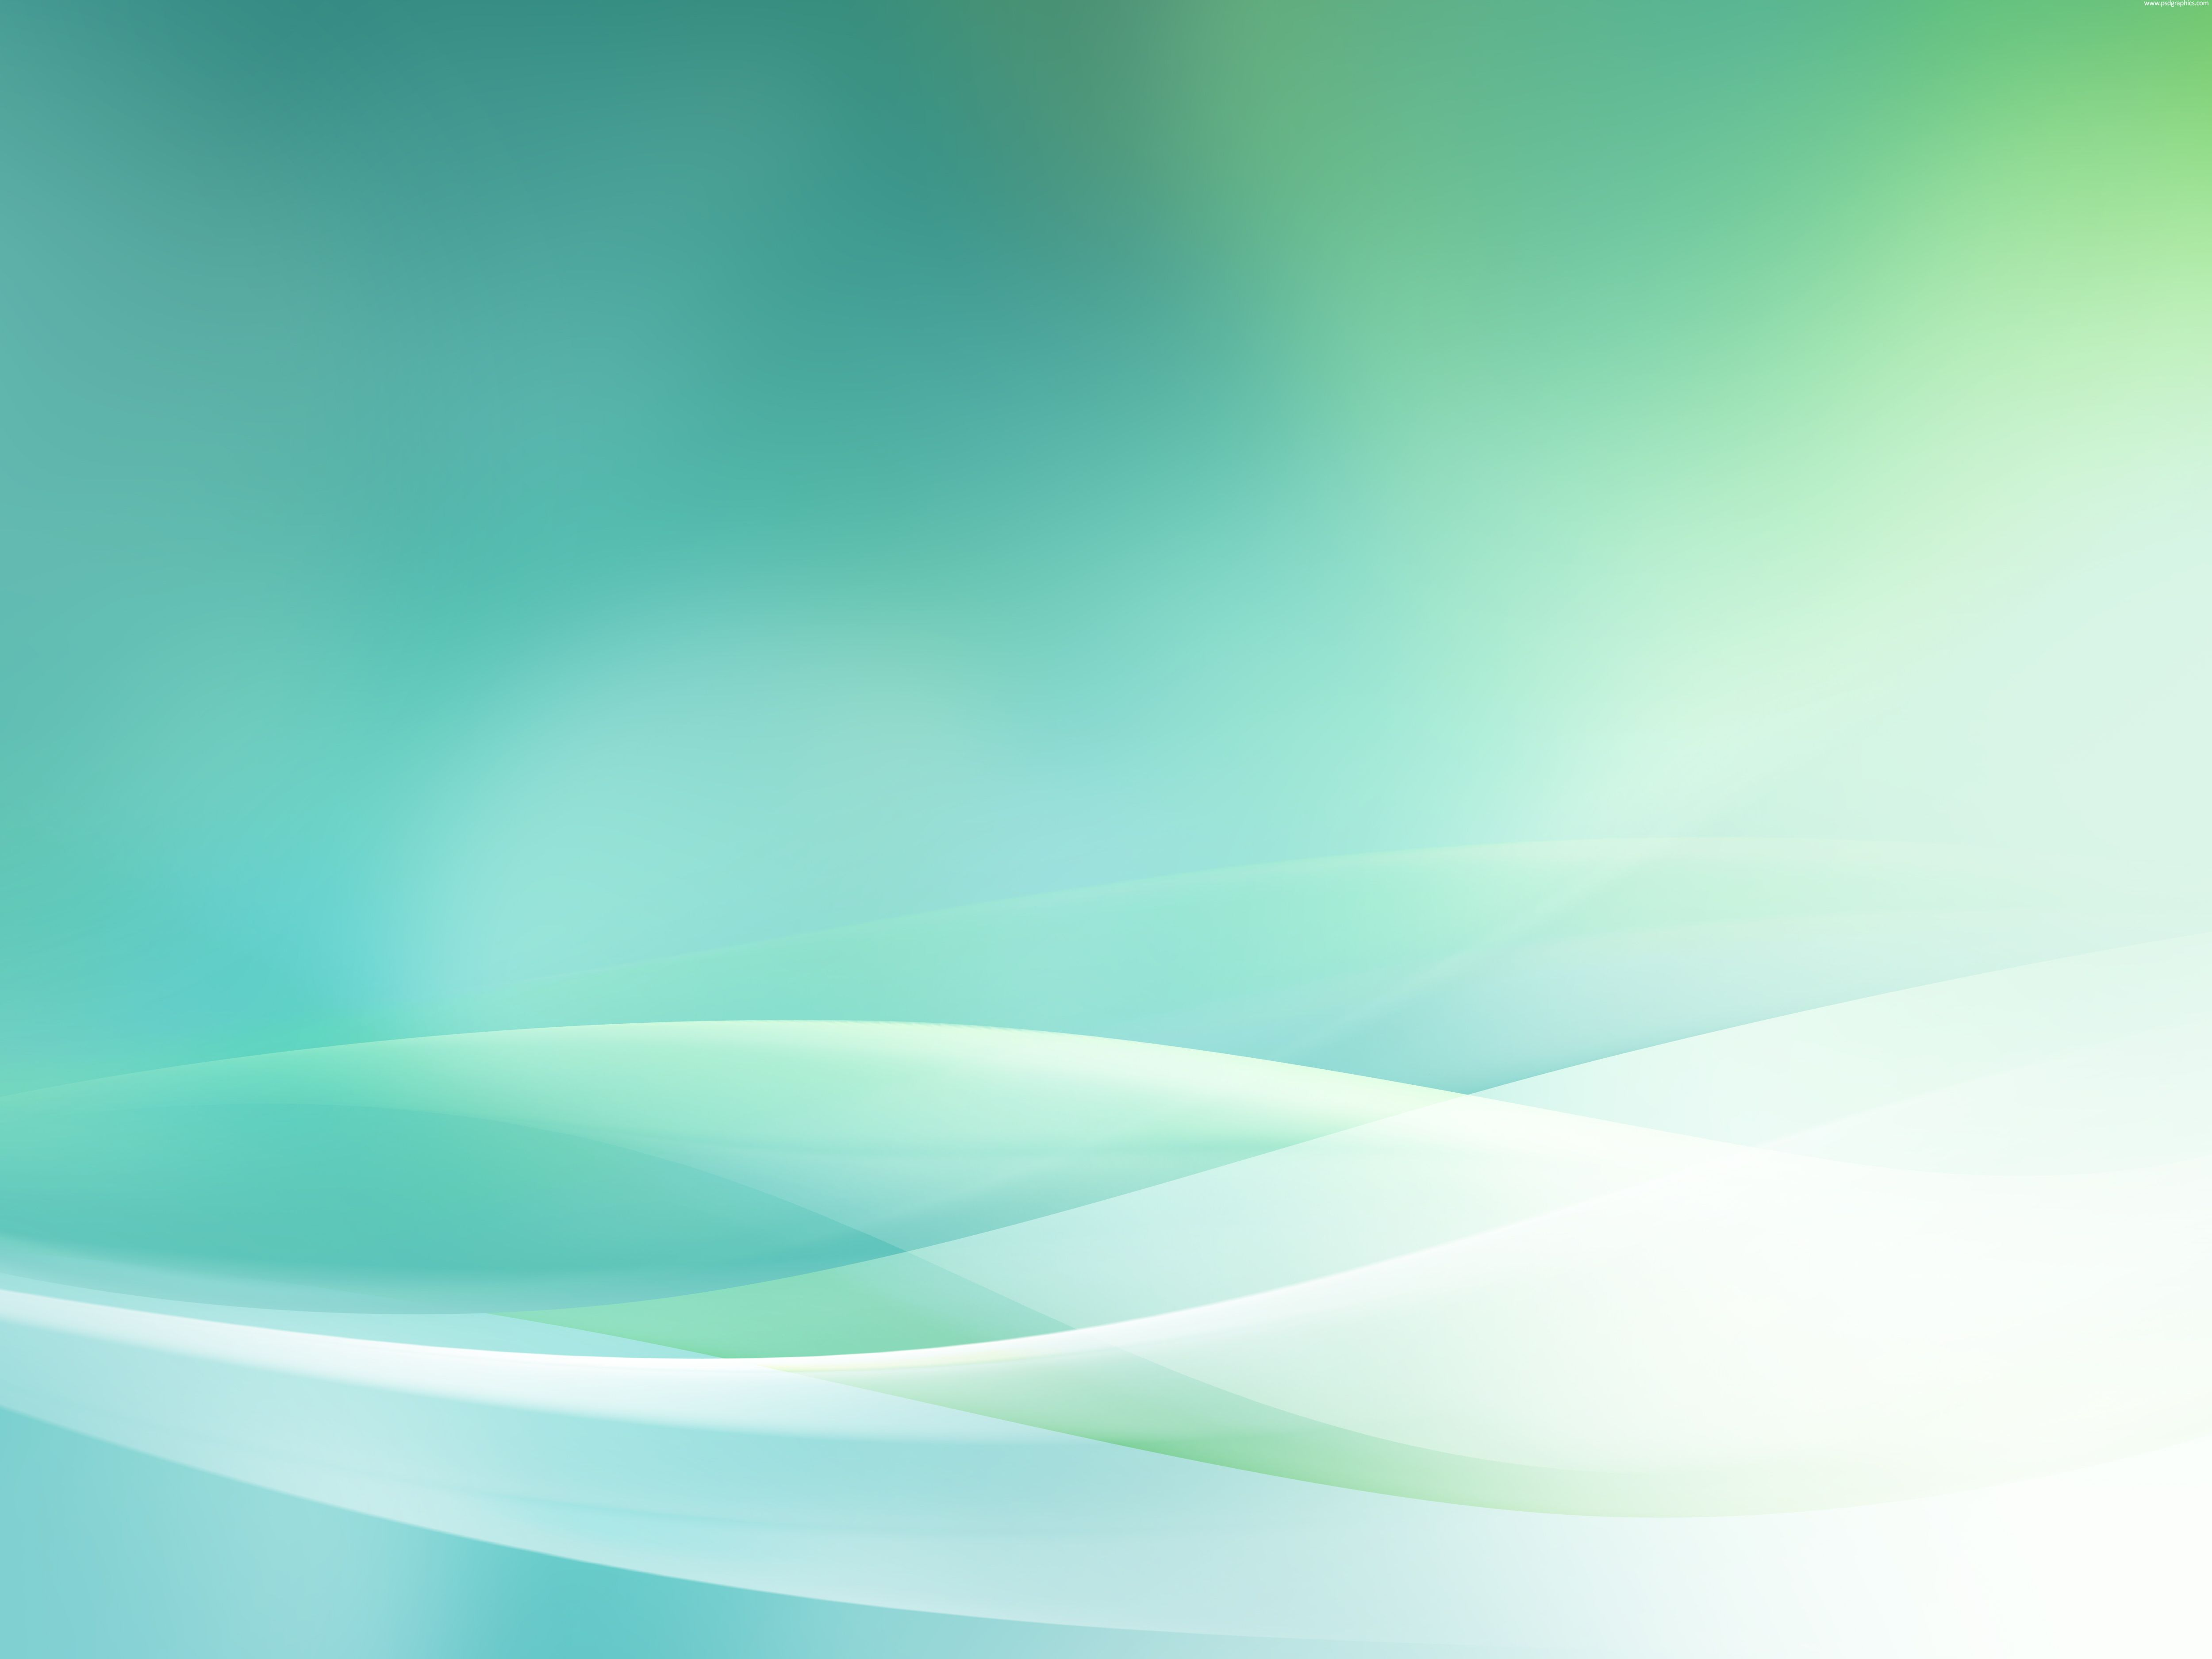 green background images | ... green spring background soft blue ...